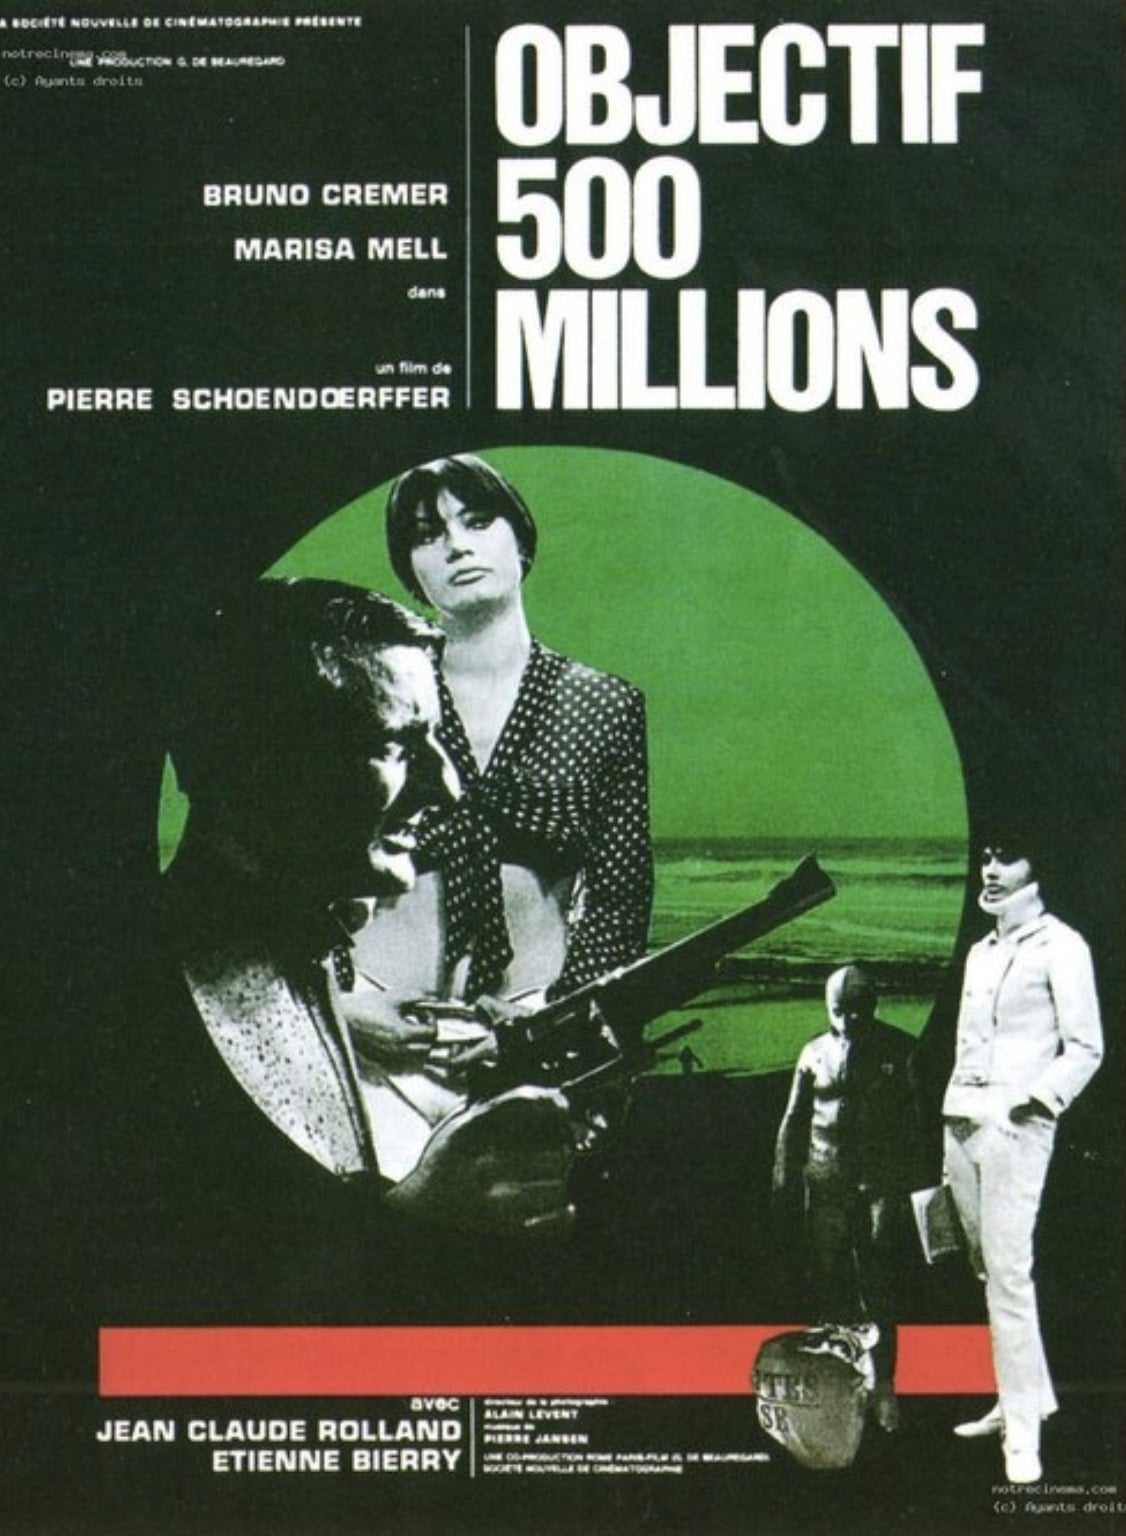 Objective: 500 Million (1966)